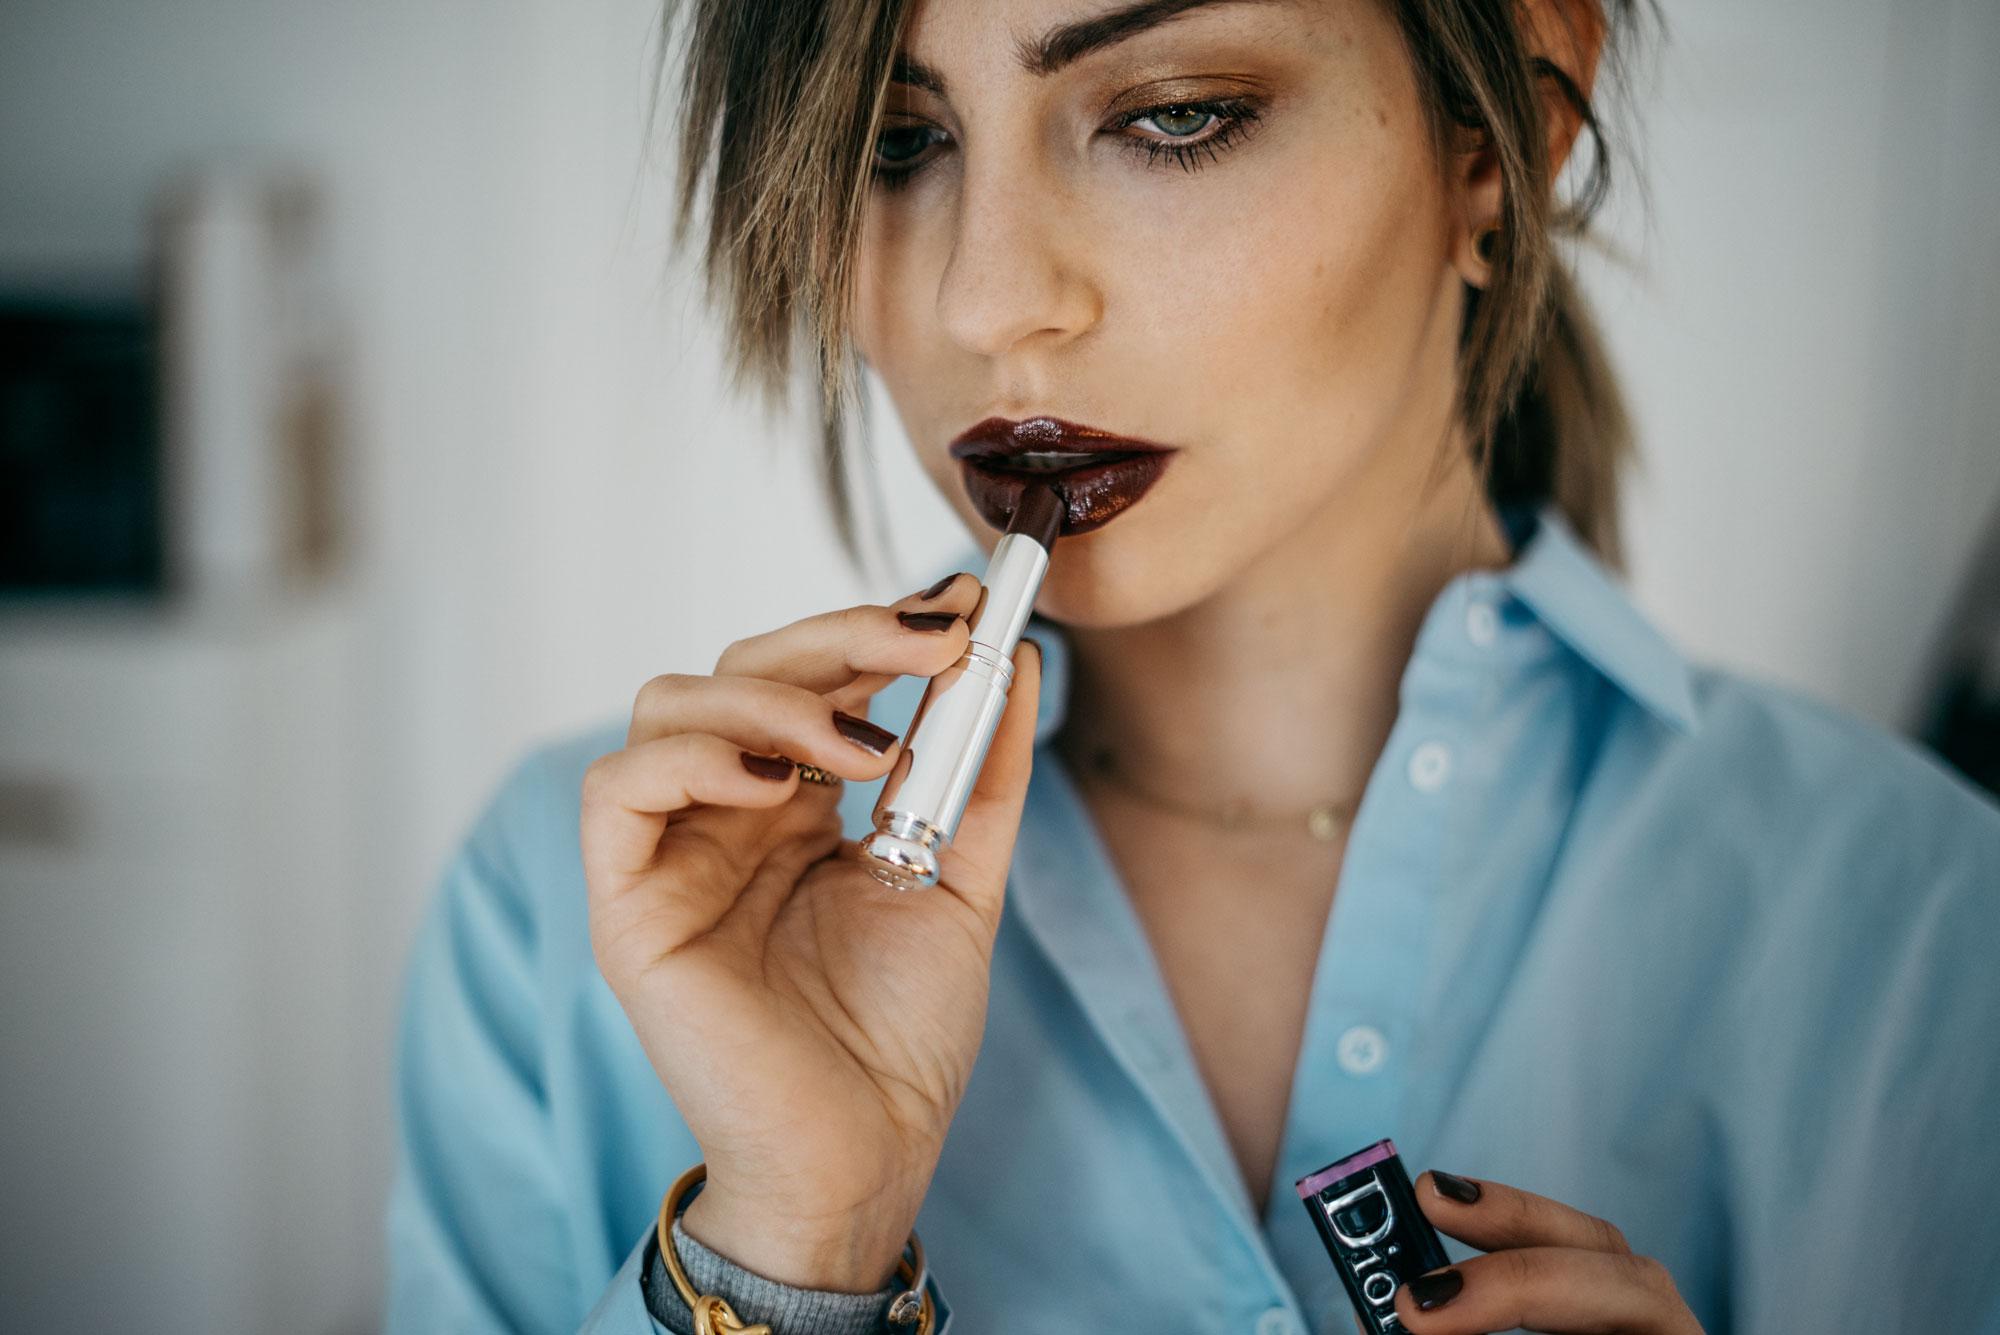 Dior Lippenstift | Produktempfehlung | Liquid Laquer Addict